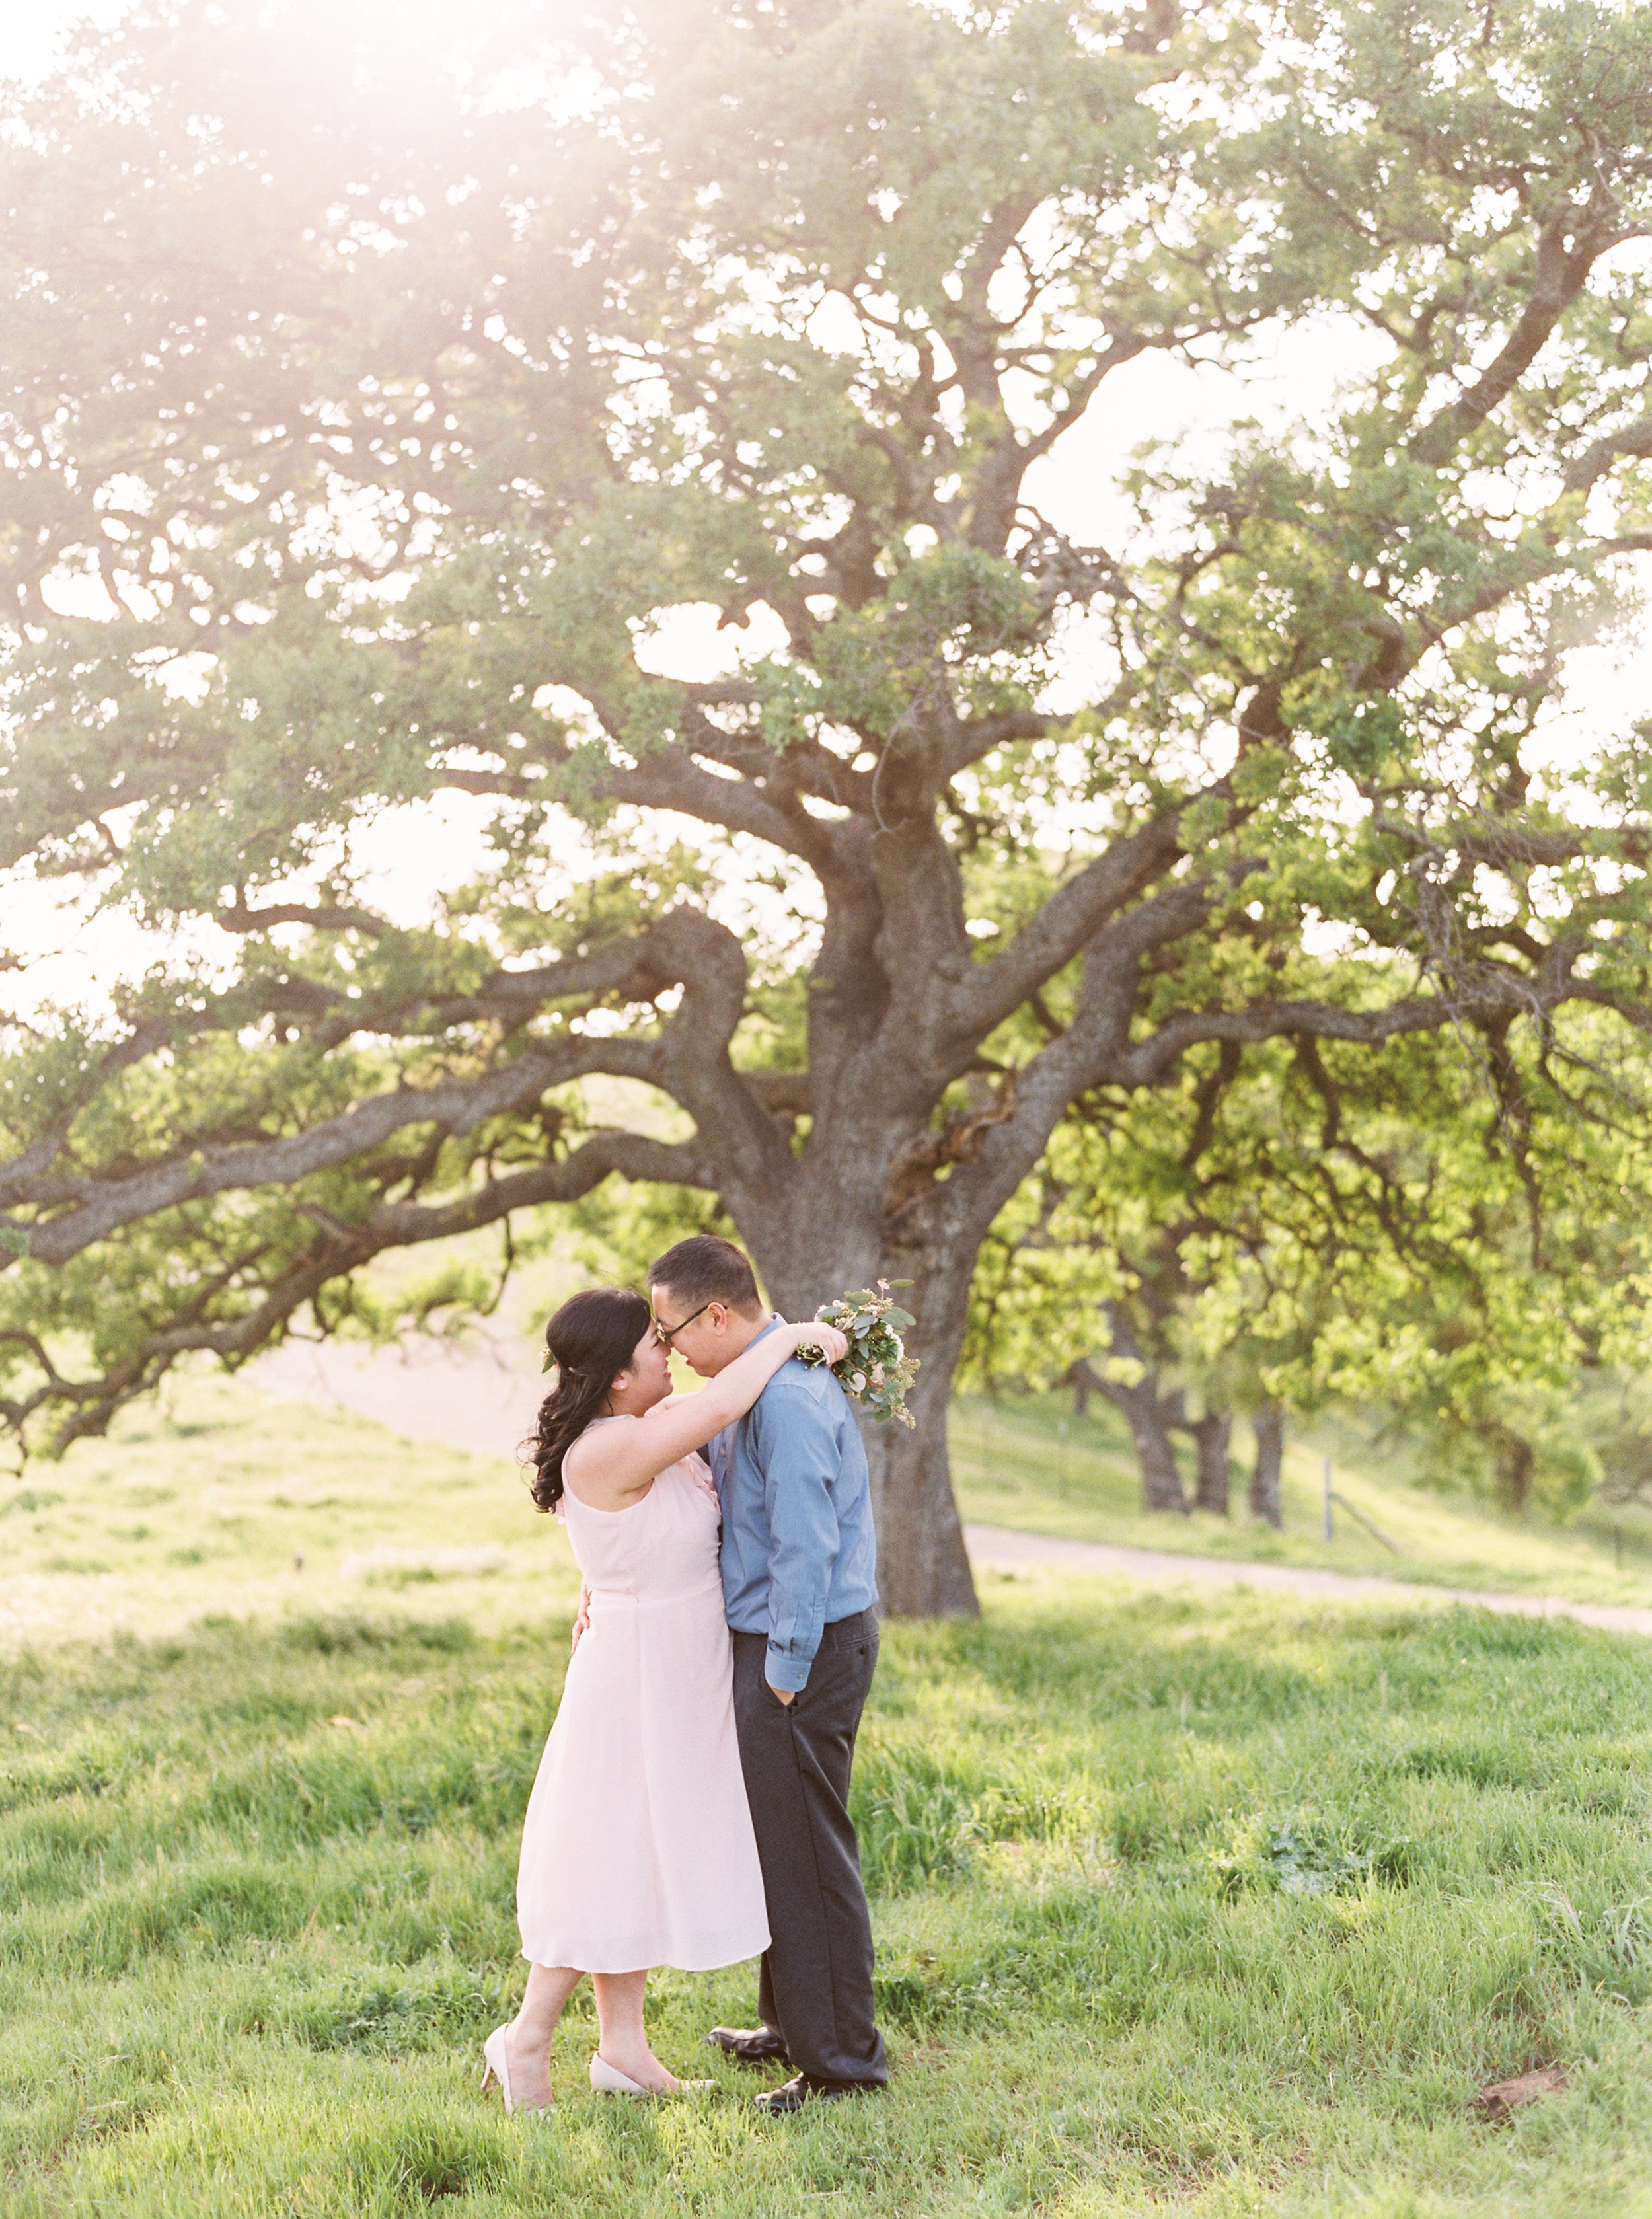 del-valle-livermore-bay-area-wedding-photographer-57.jpg